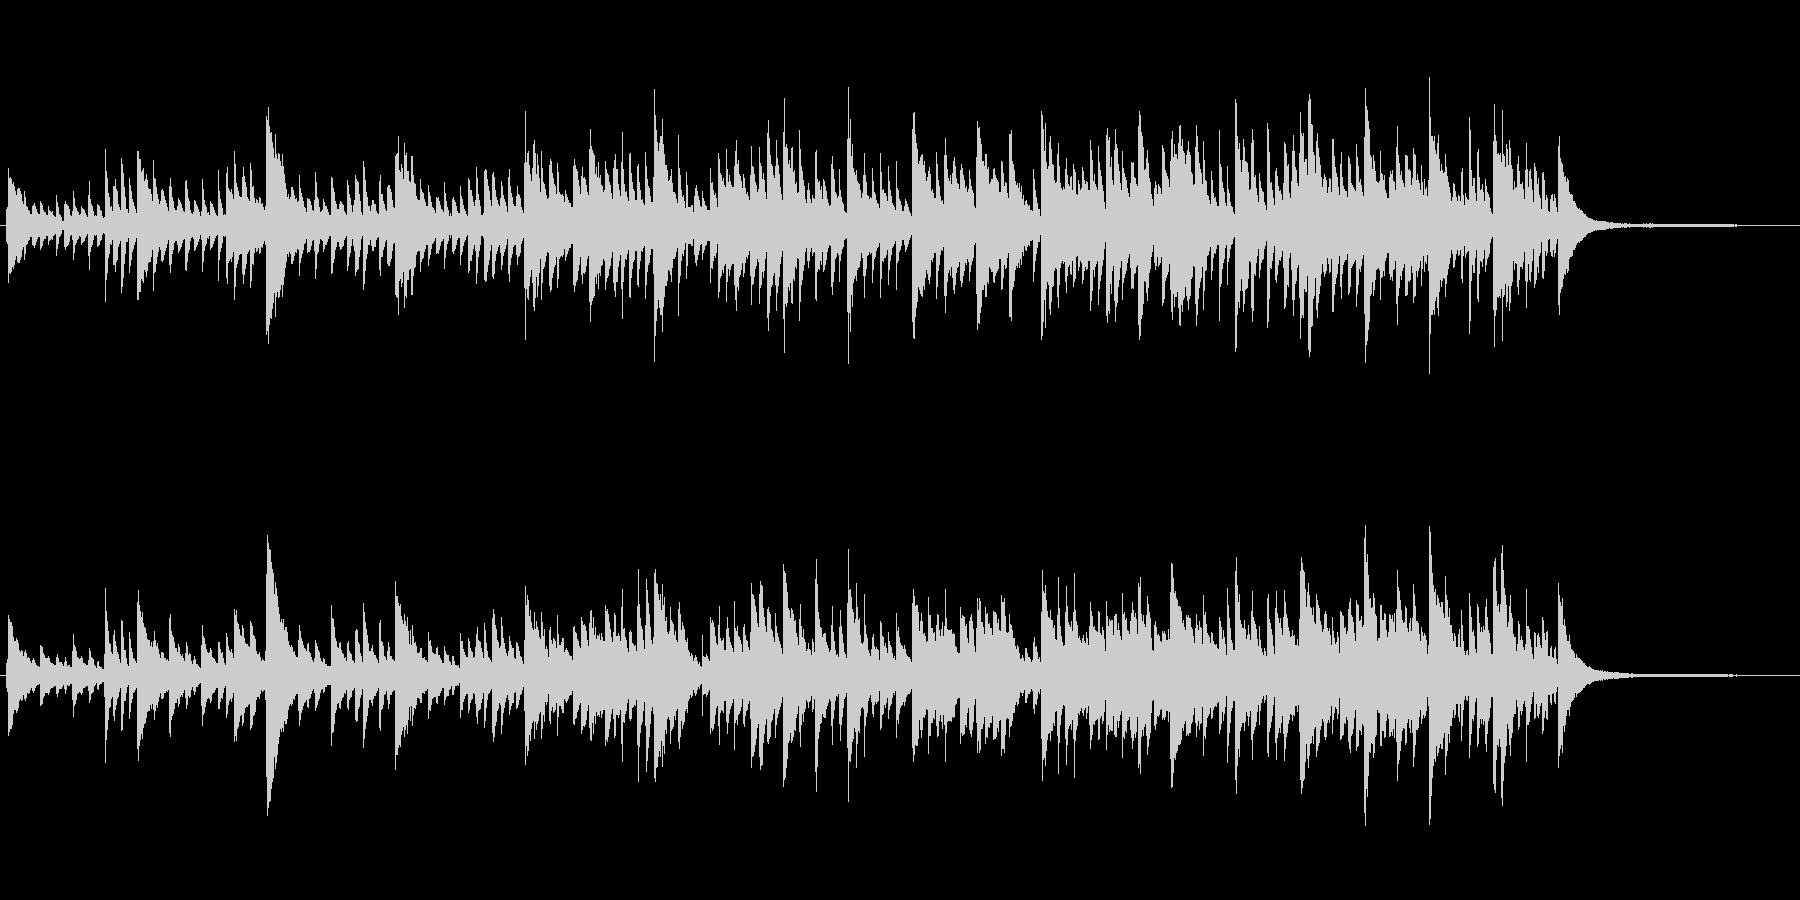 CM映像、シンプル、スタイリッシュピアノの未再生の波形